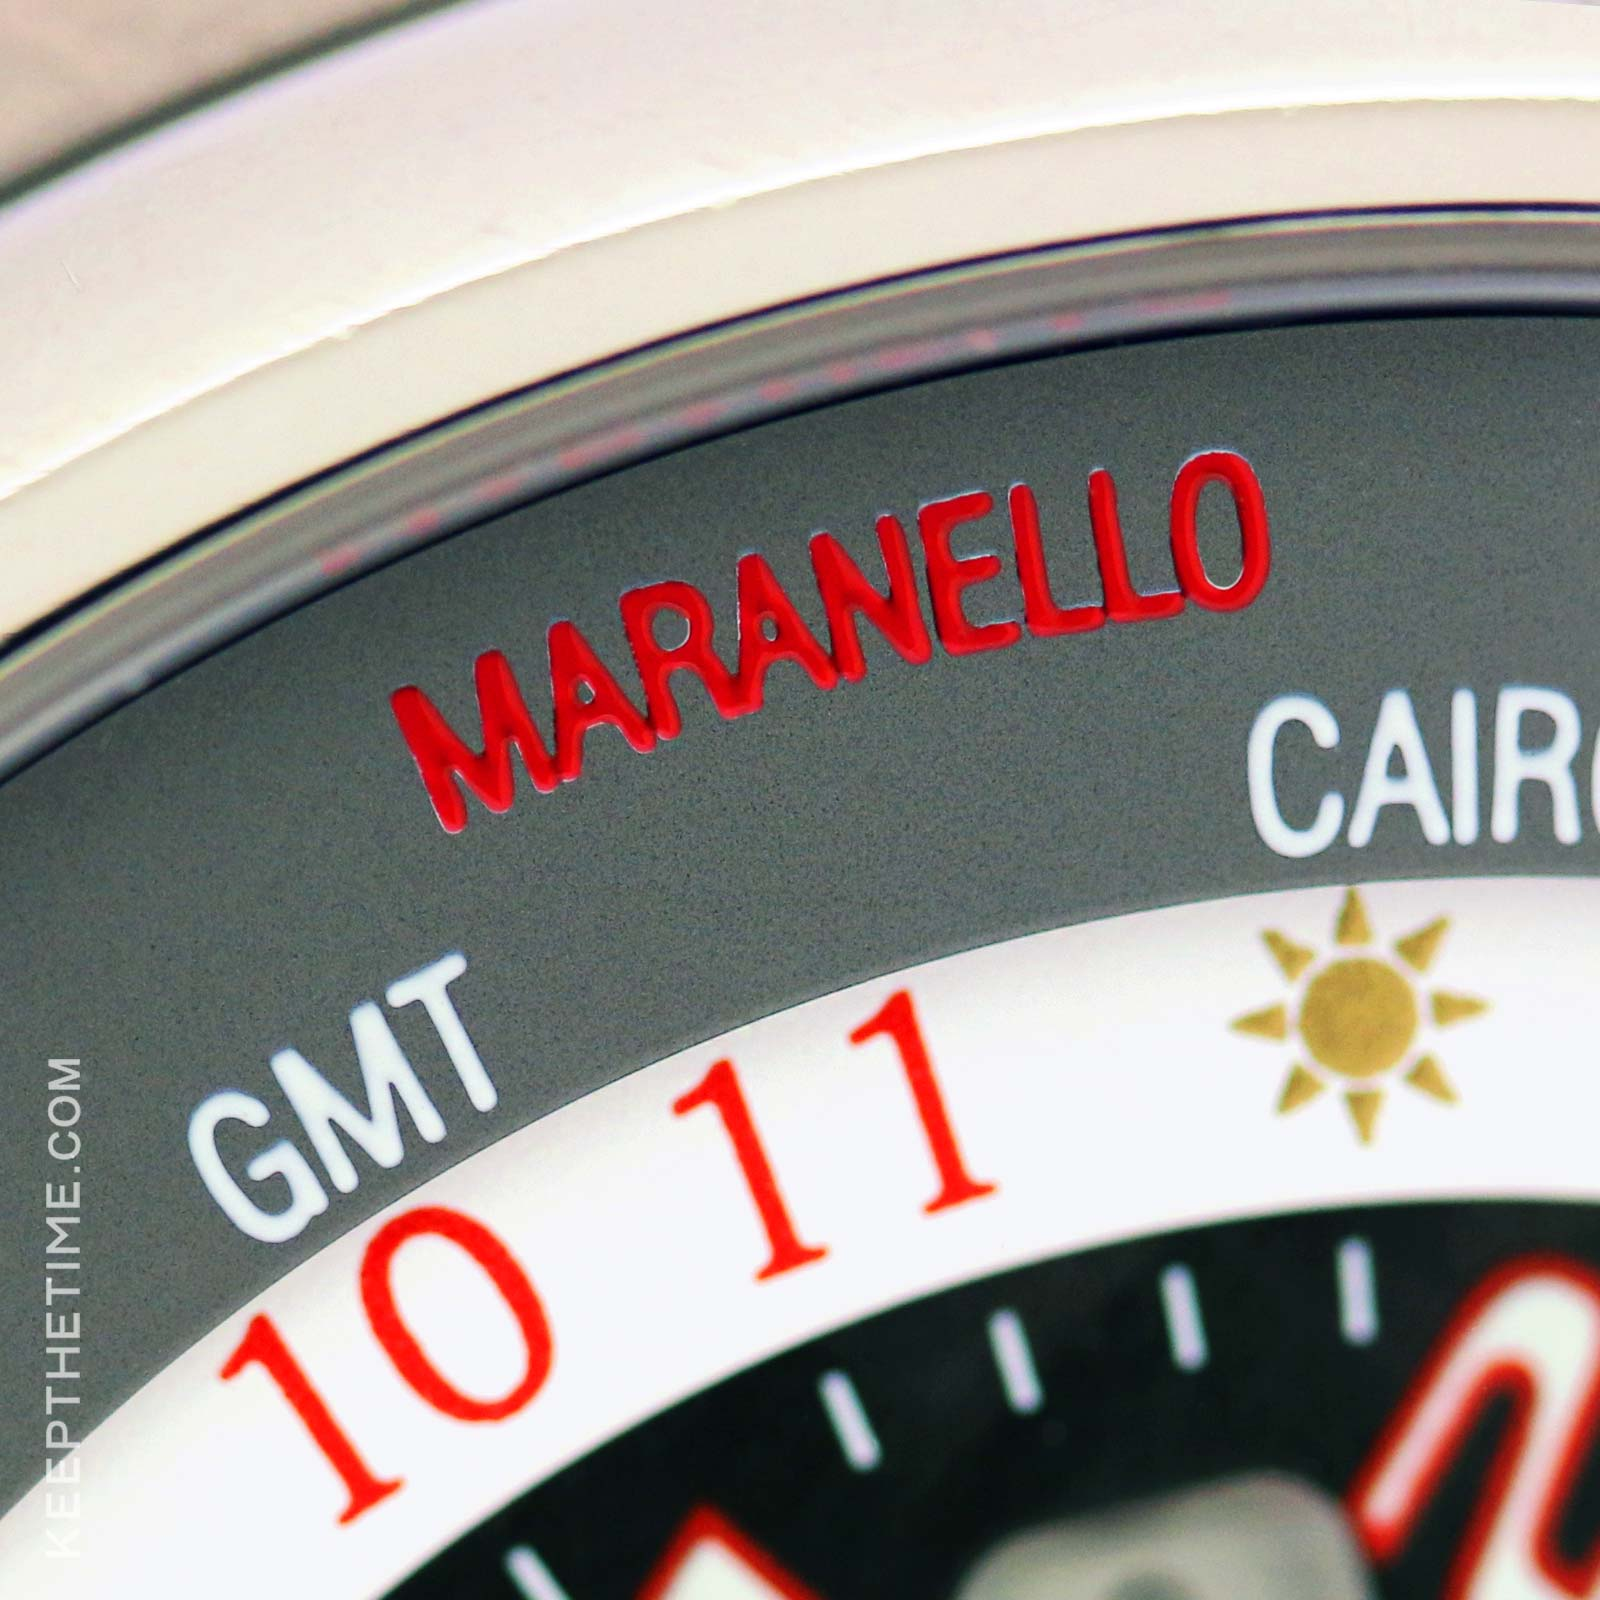 Girard-Perregaux Ferrari Titanium USA 50th Anniversary LE